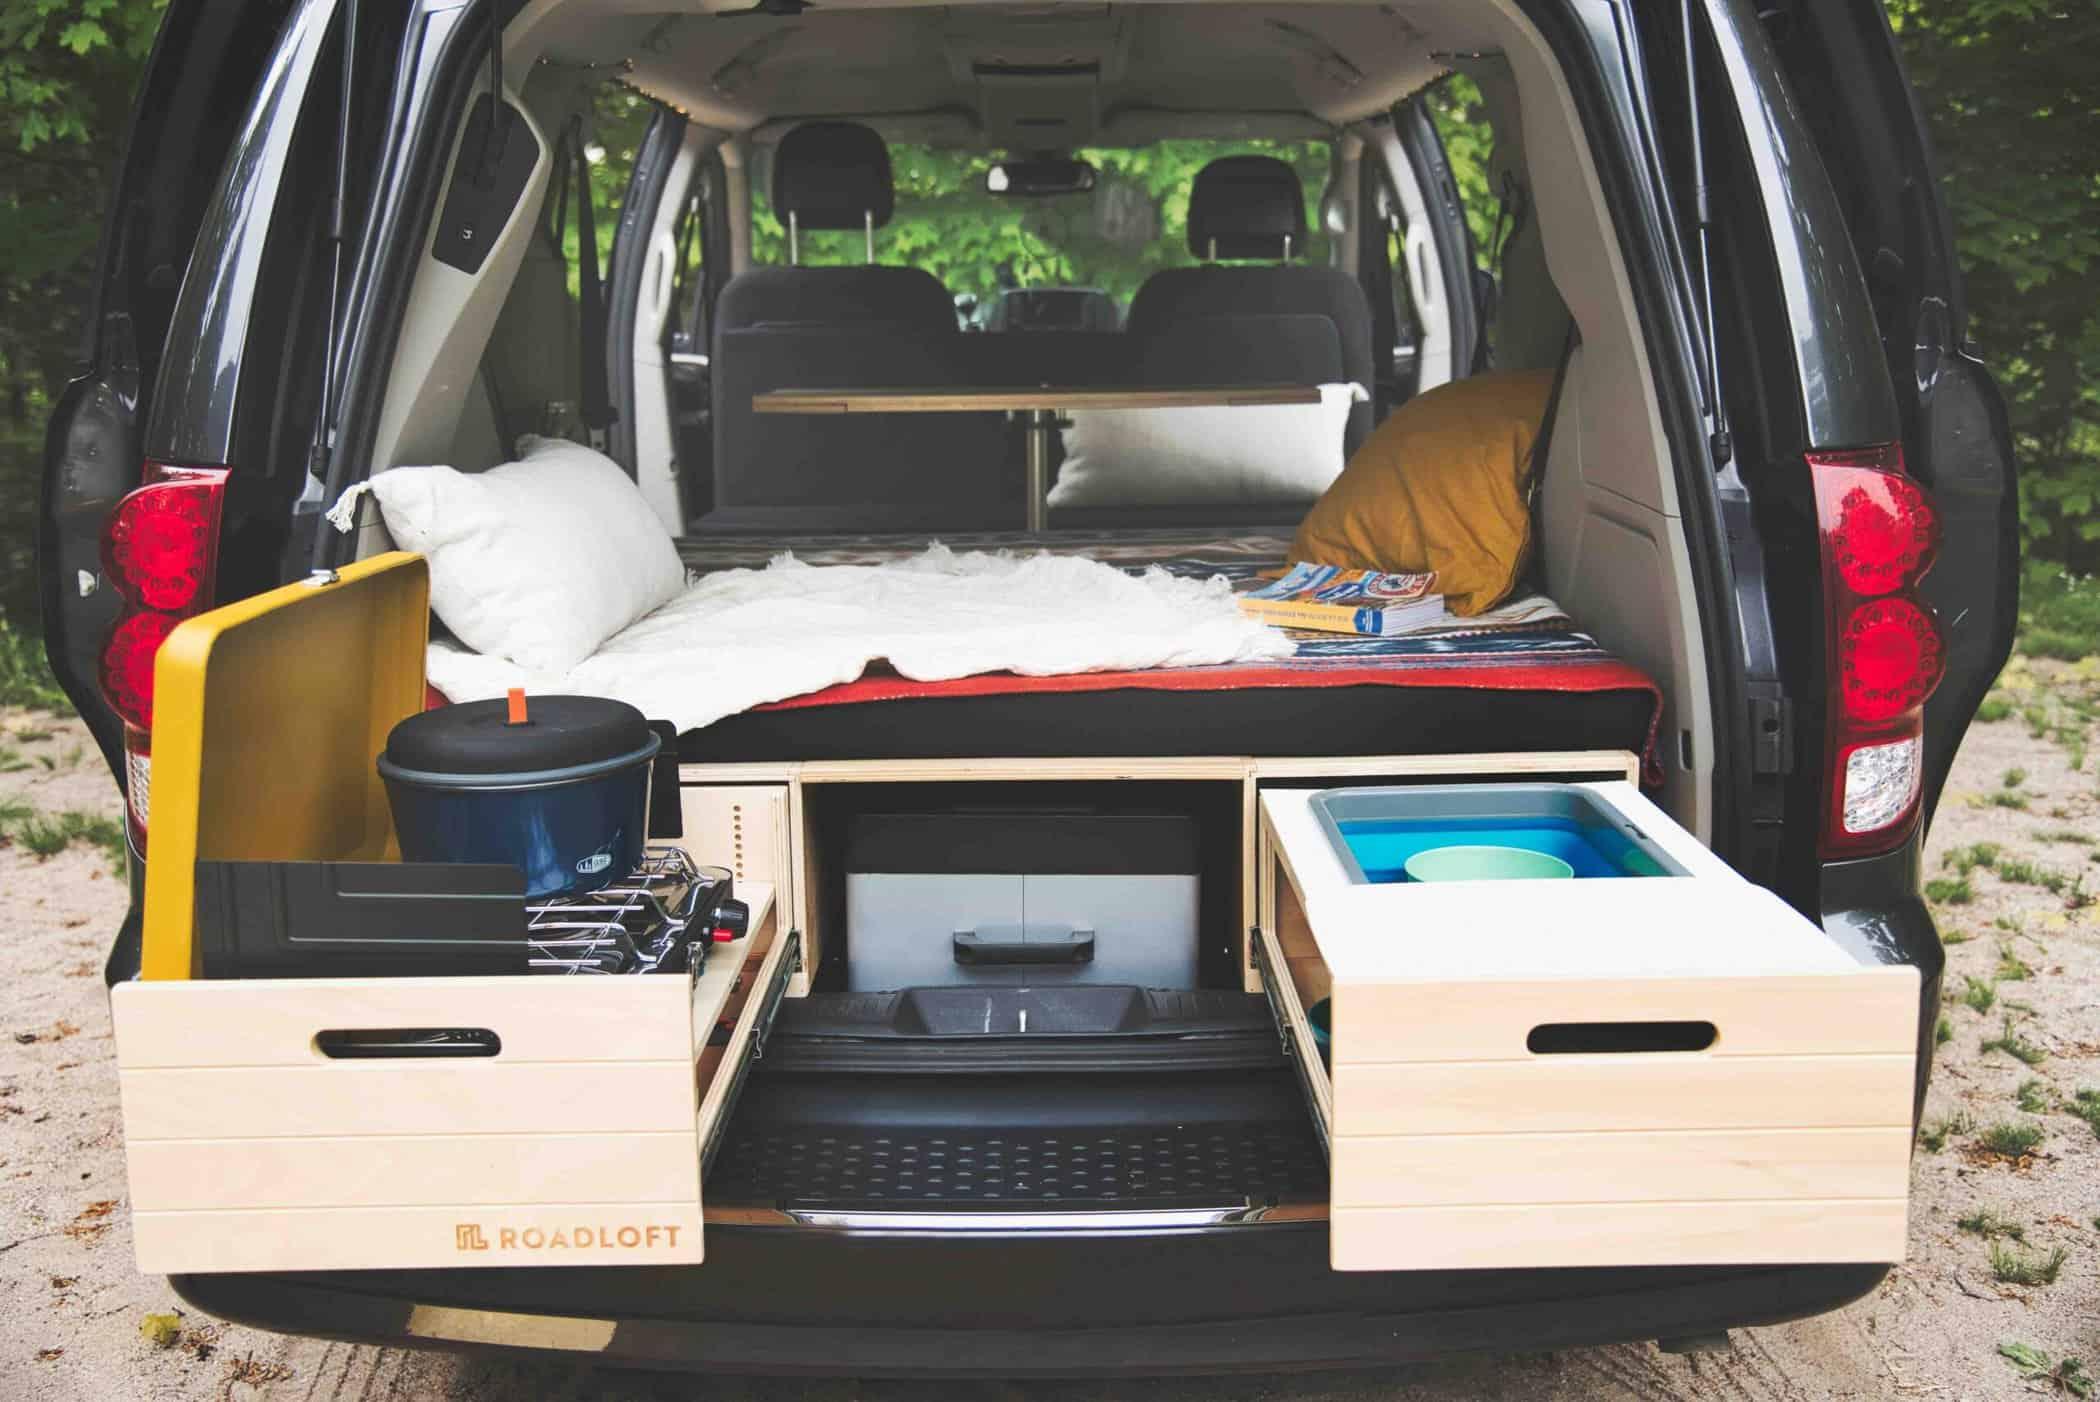 dodge grand caravan camper Order your Minivan camper conversion Kit for Dodge Caravan - Roadloft